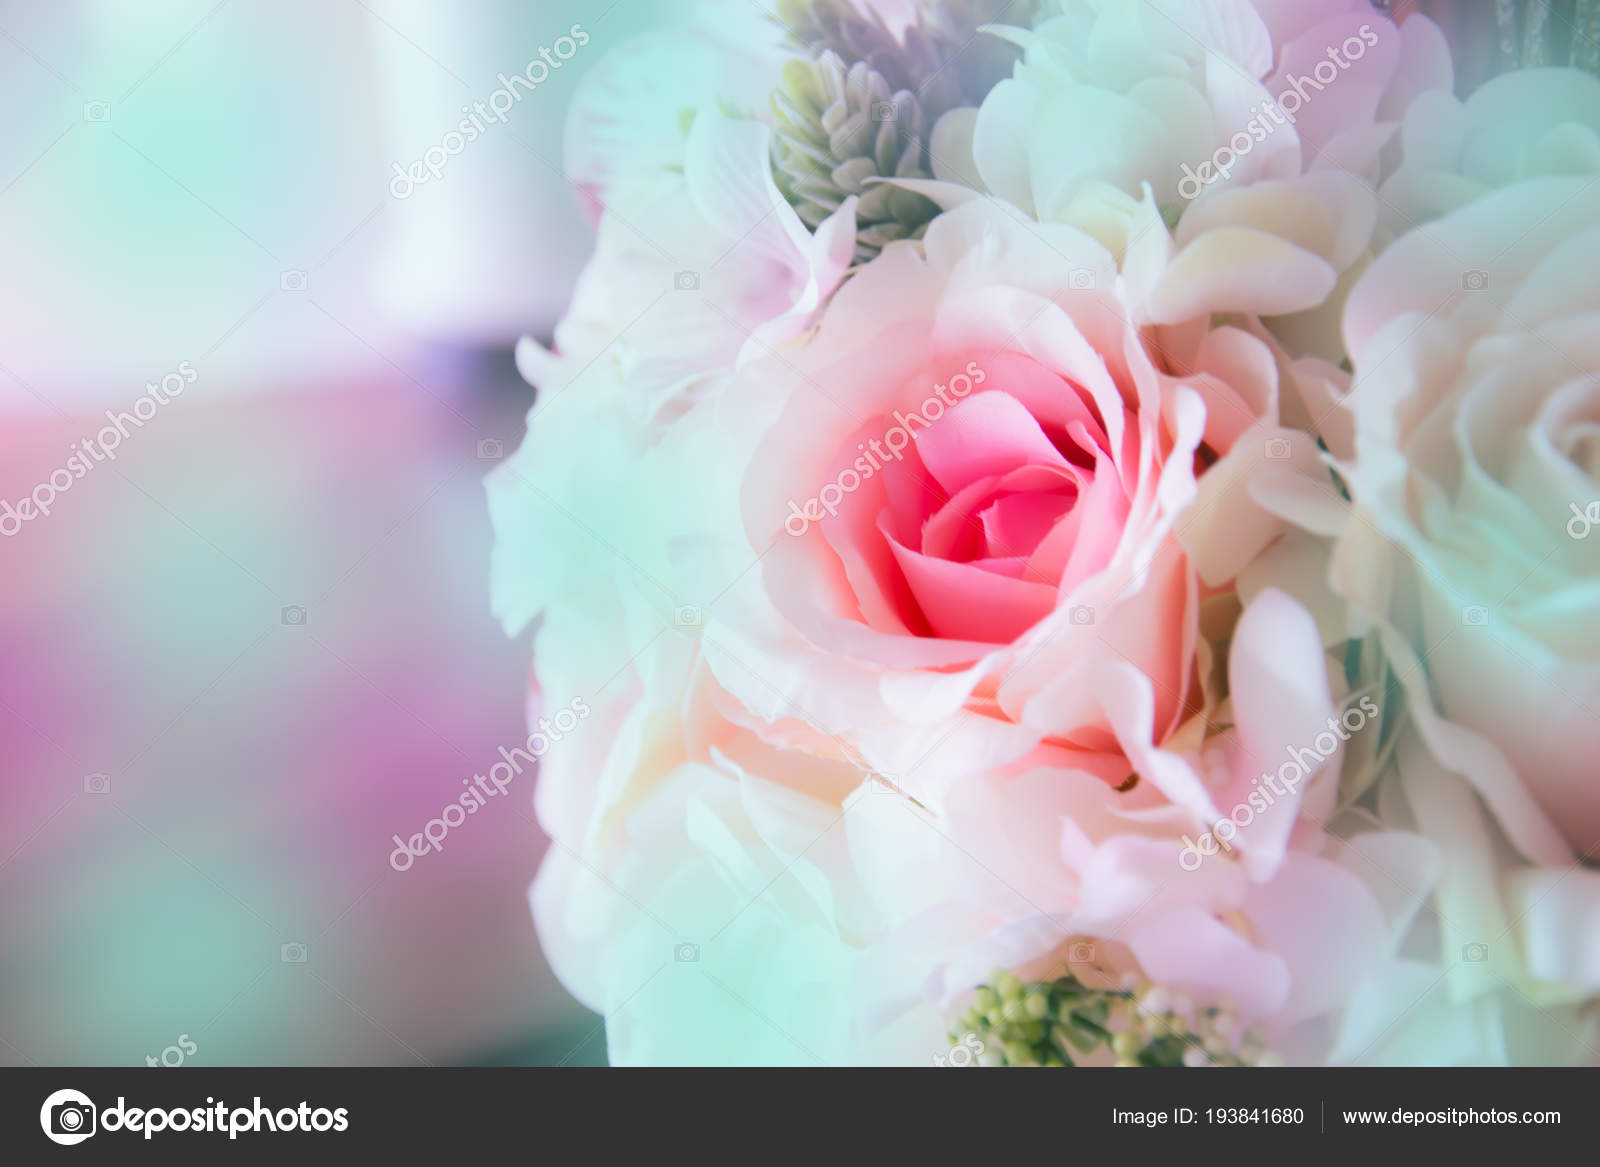 Rosa Rosen Schöne Blumen Stockfoto Tlovely 193841680